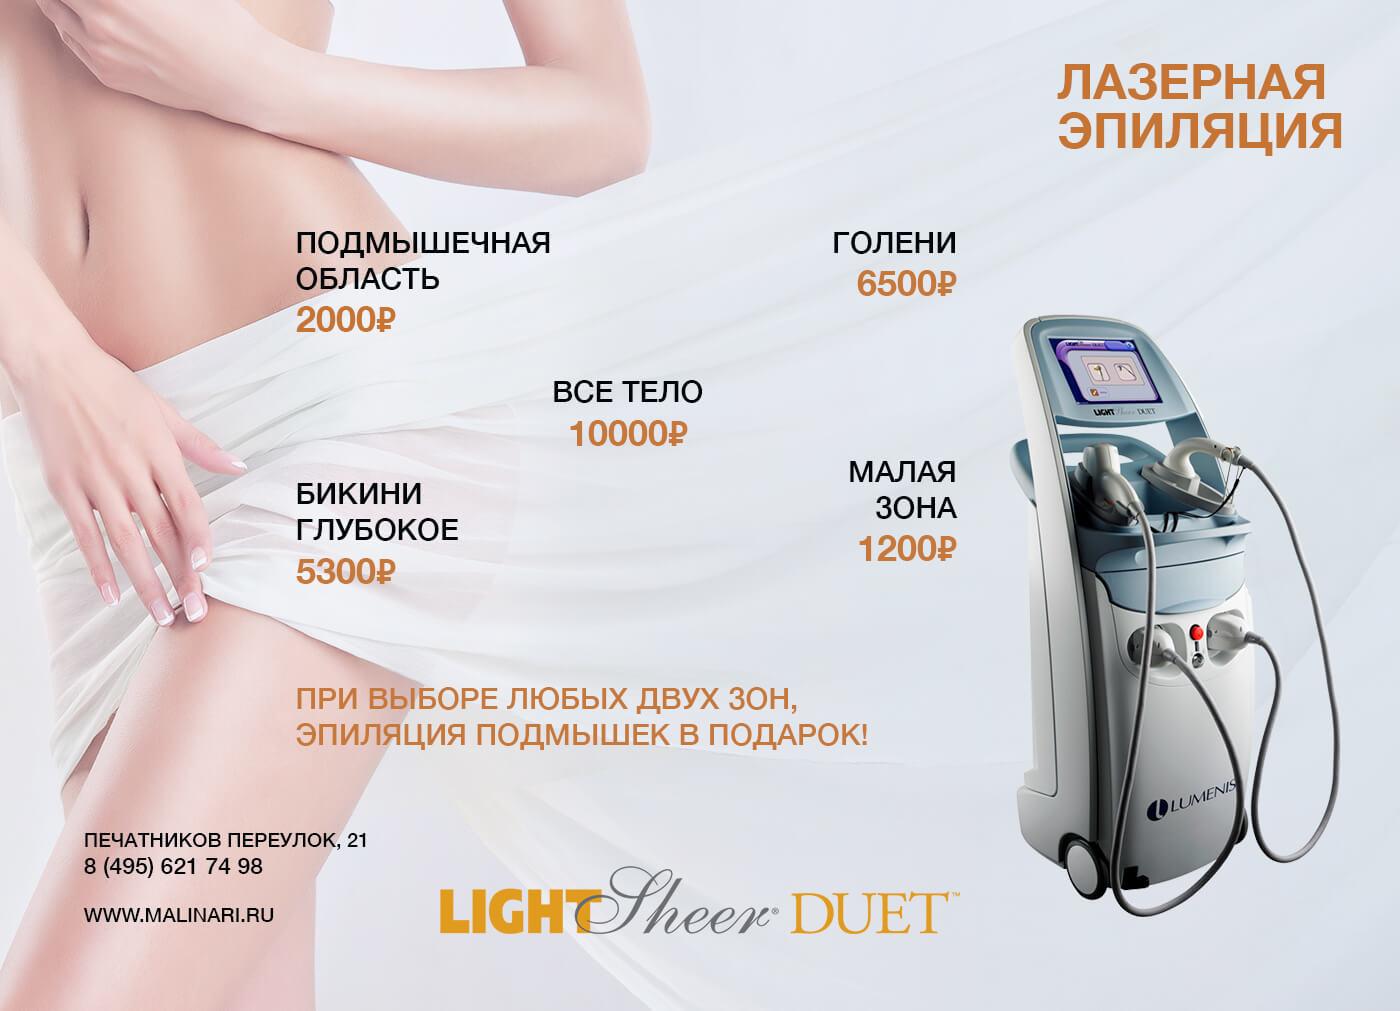 Лазерная эпиляция — LightSheer Duet